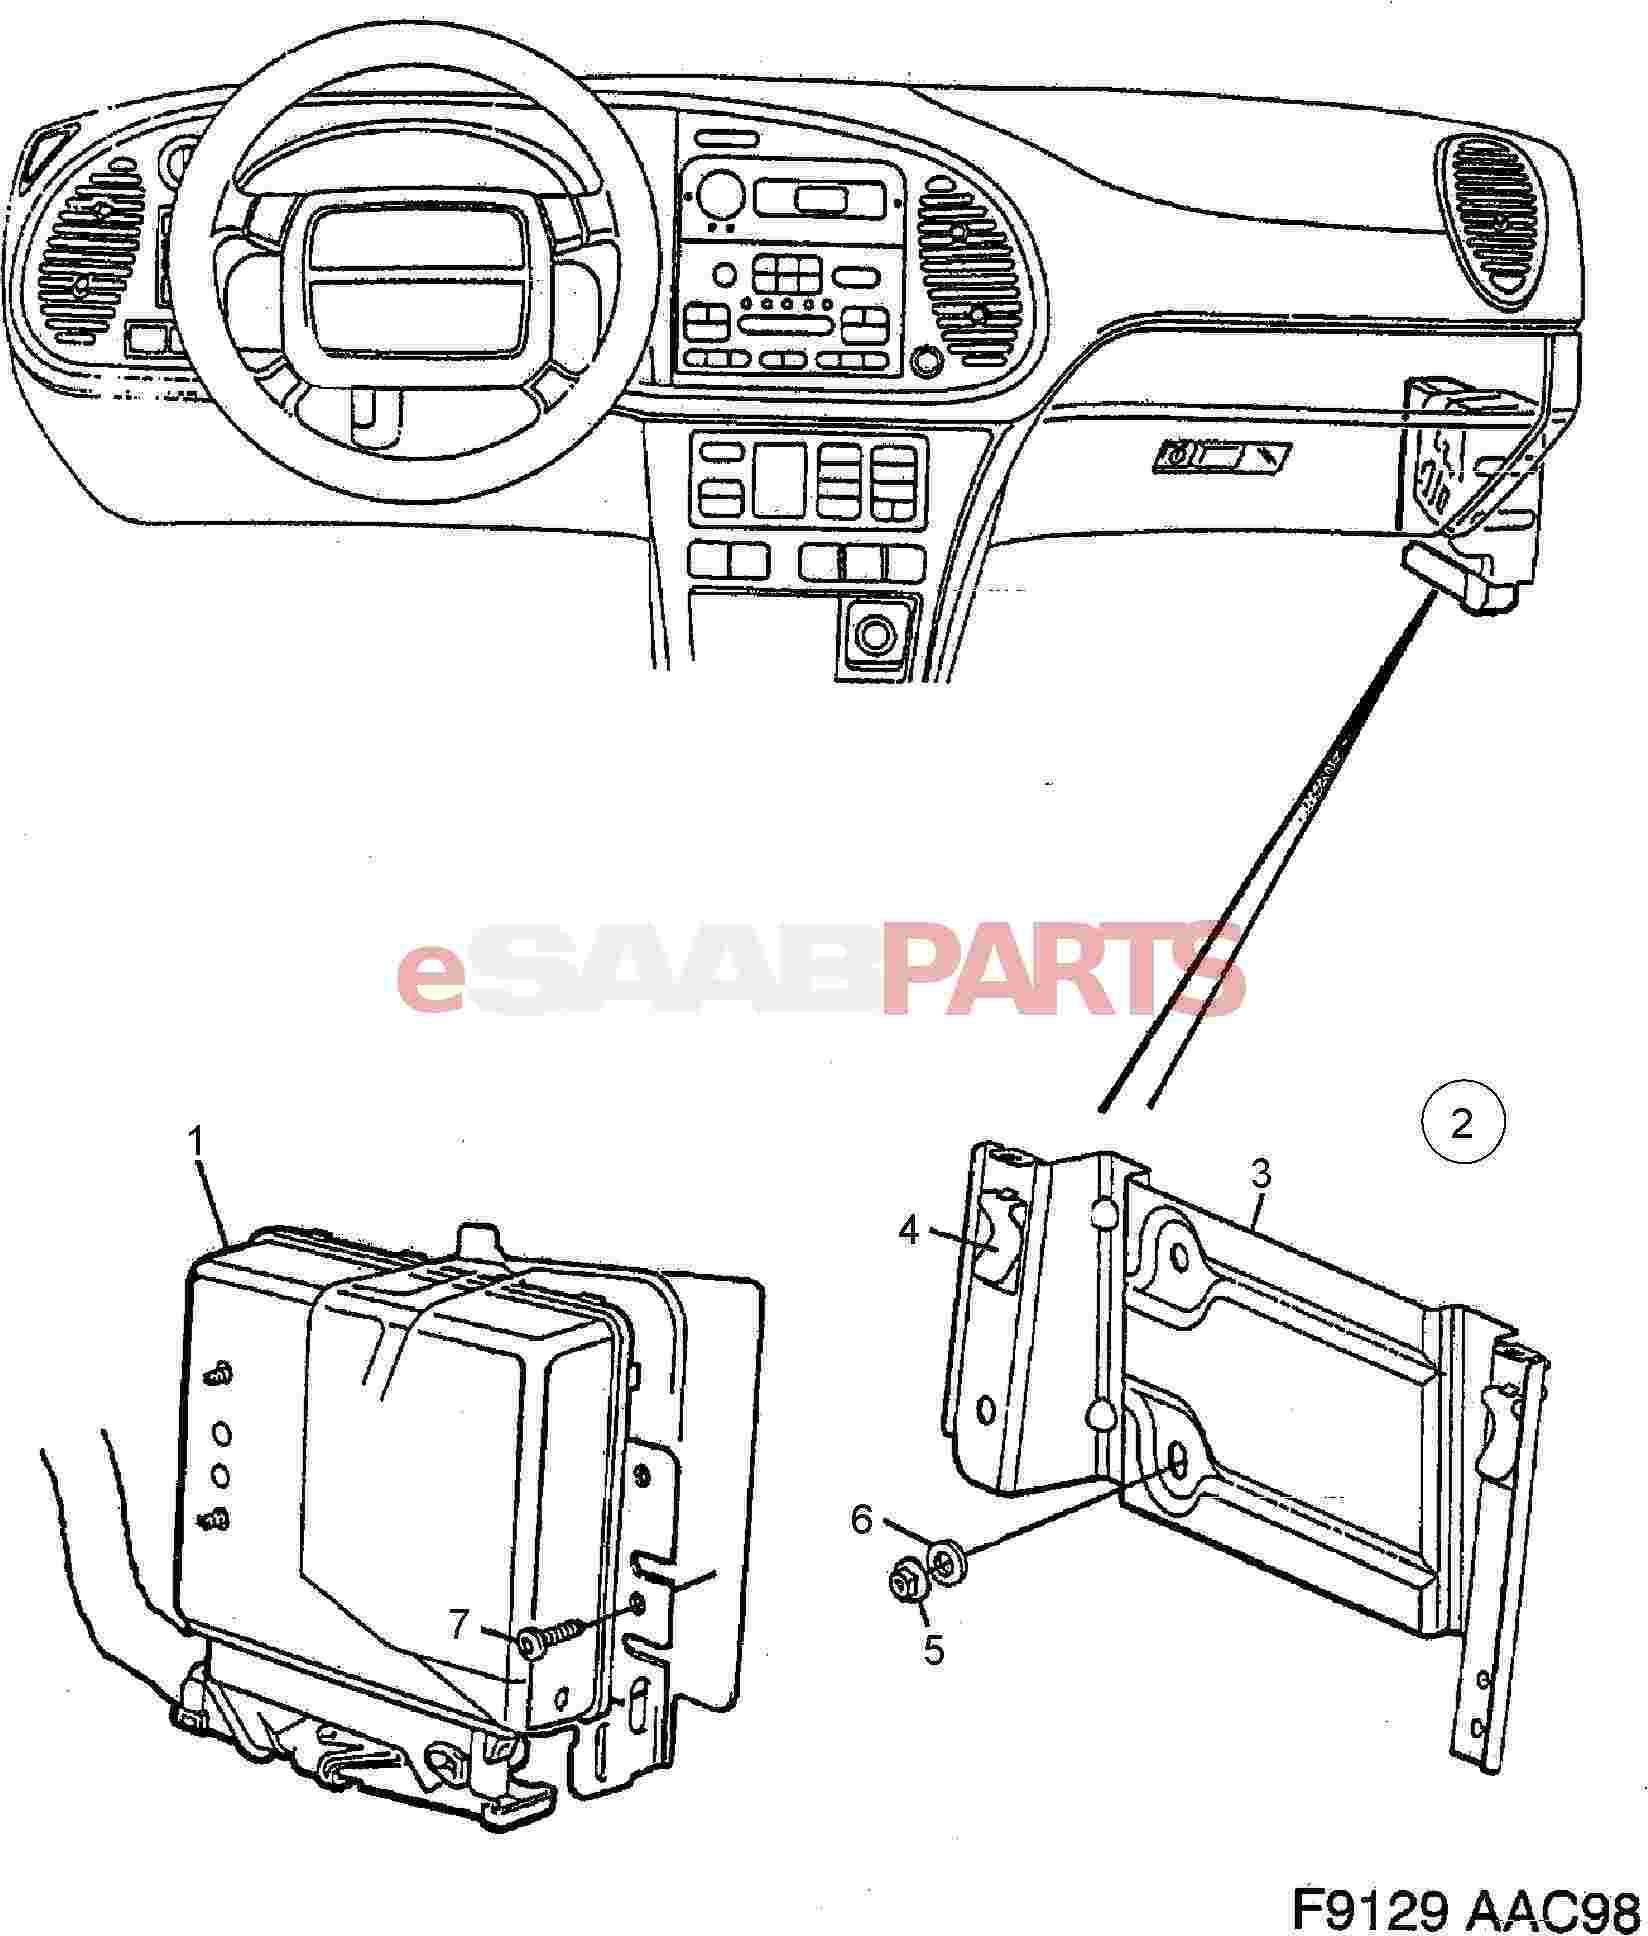 93 Honda Del Sol Fuse Box Diagram Honda Auto Wiring Diagram